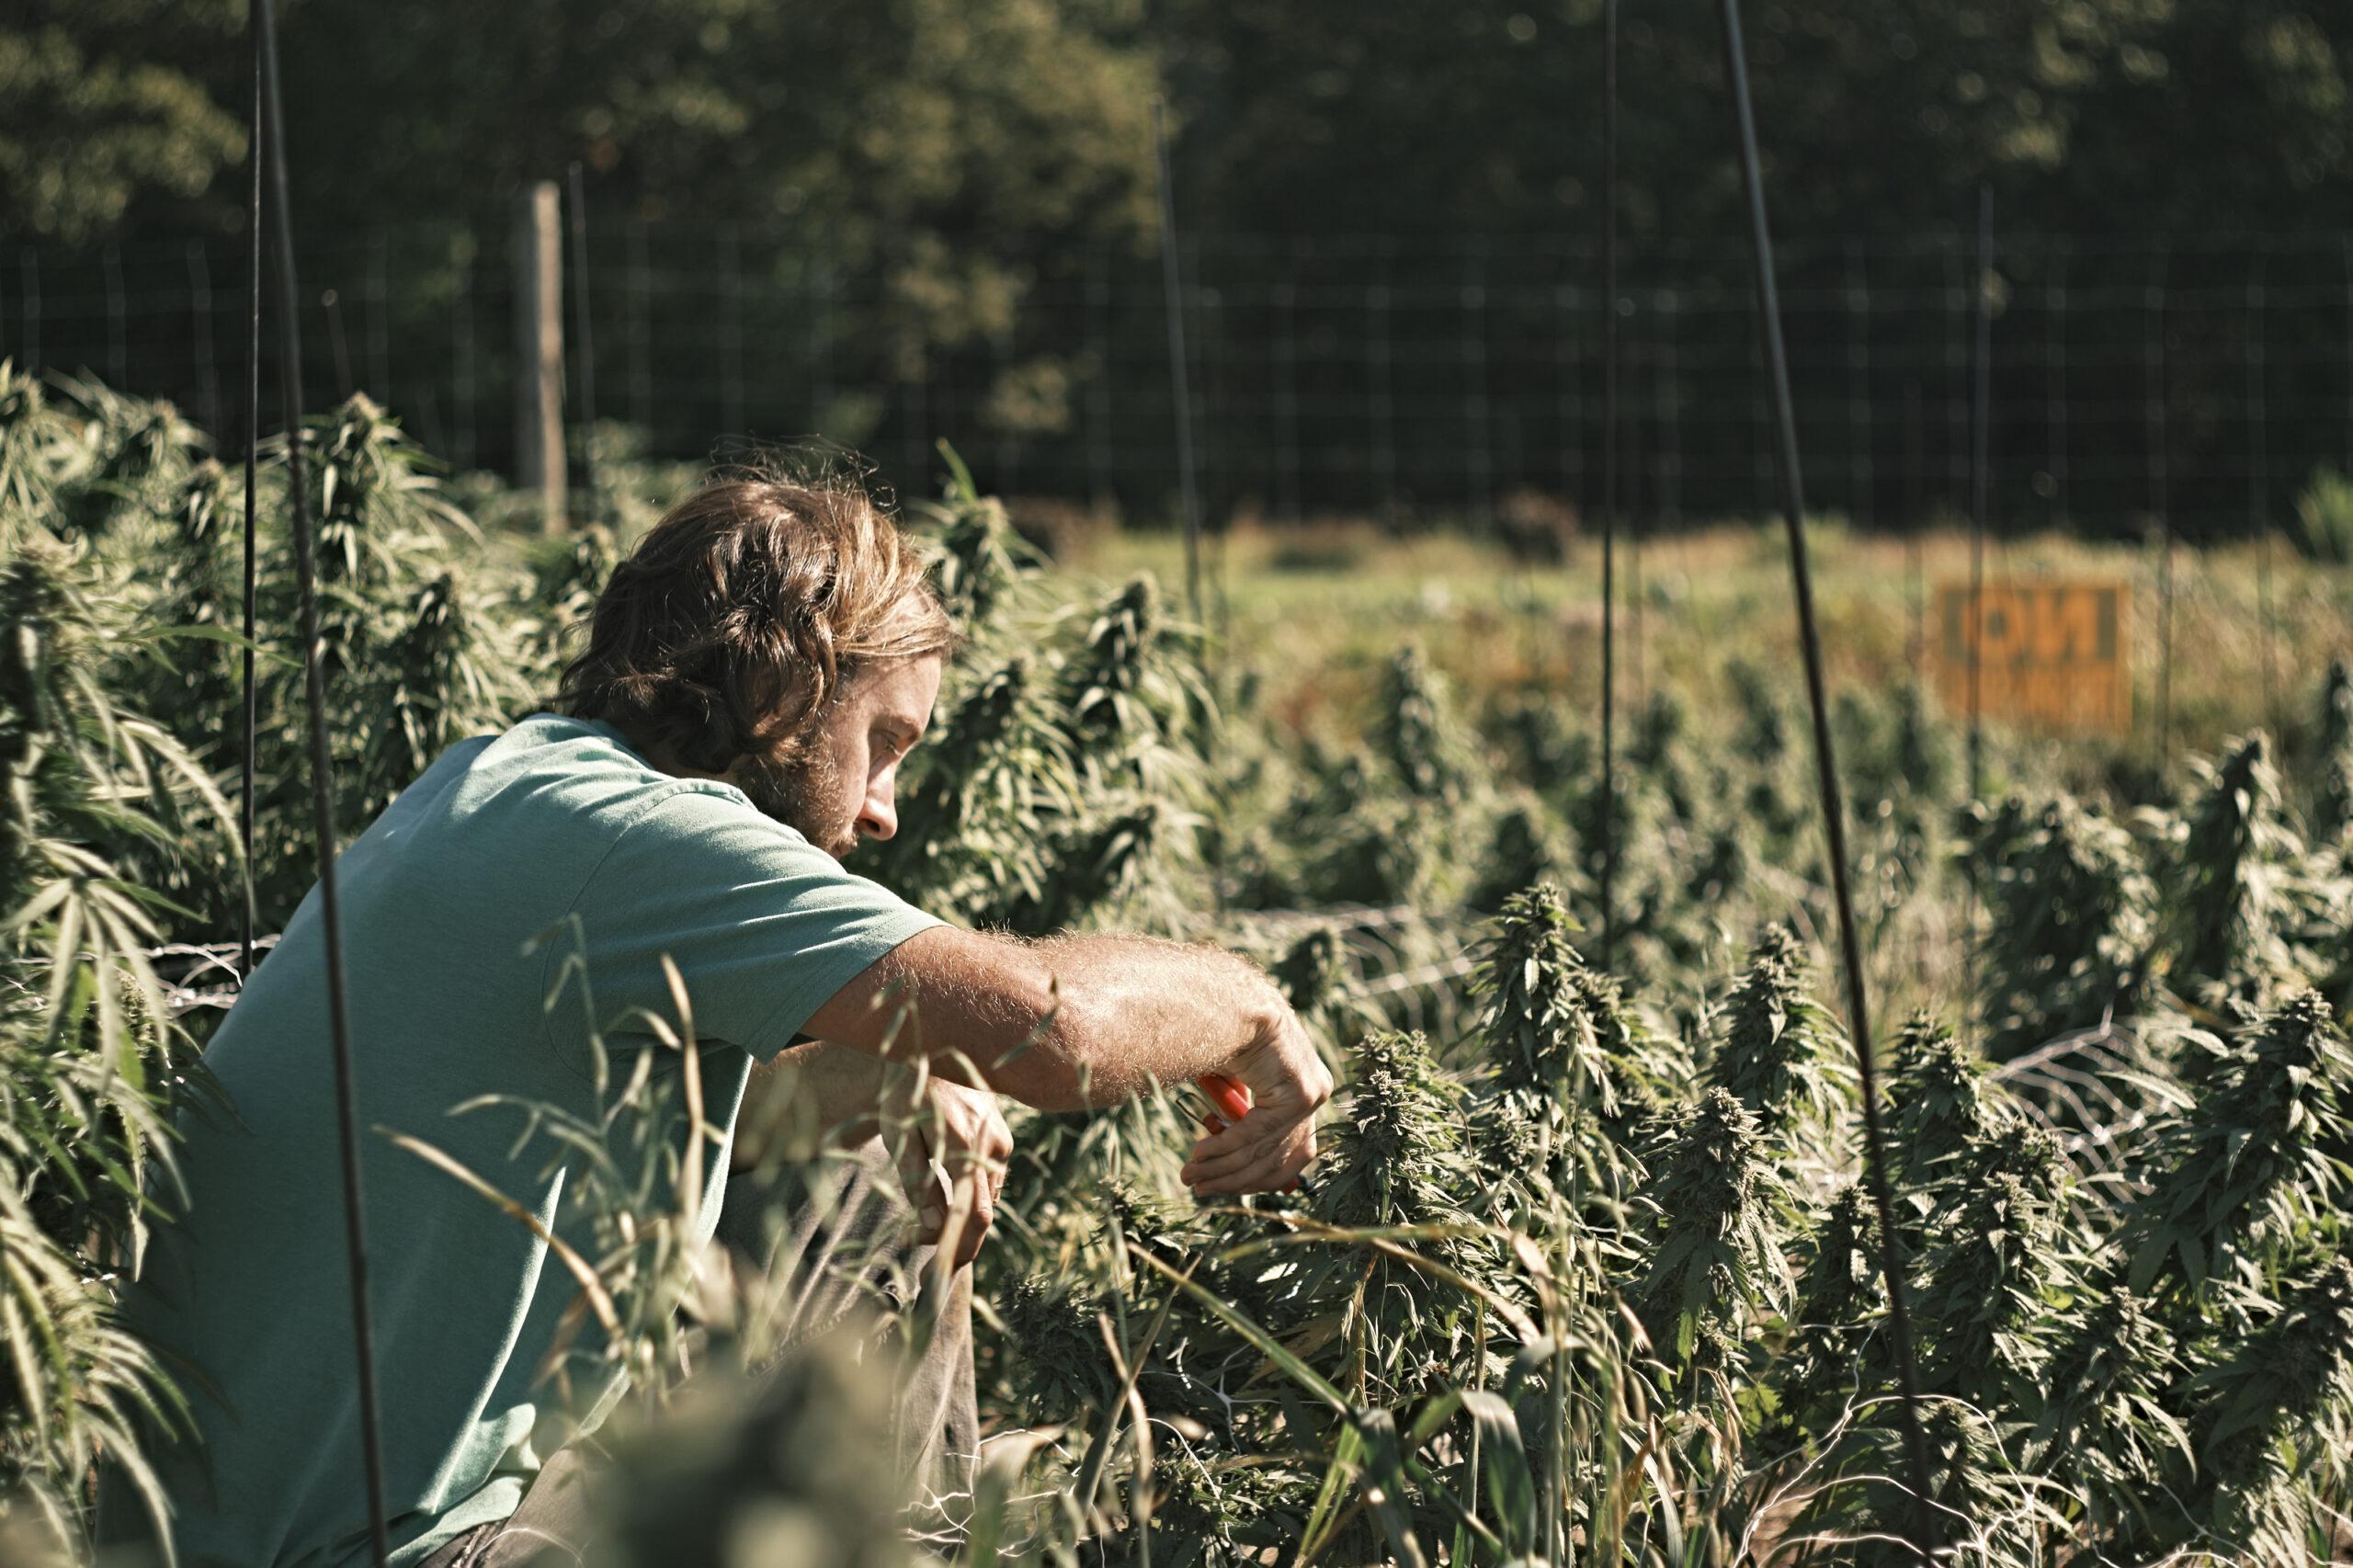 Photo Essay: Cannabis harvest season in the Maritimes